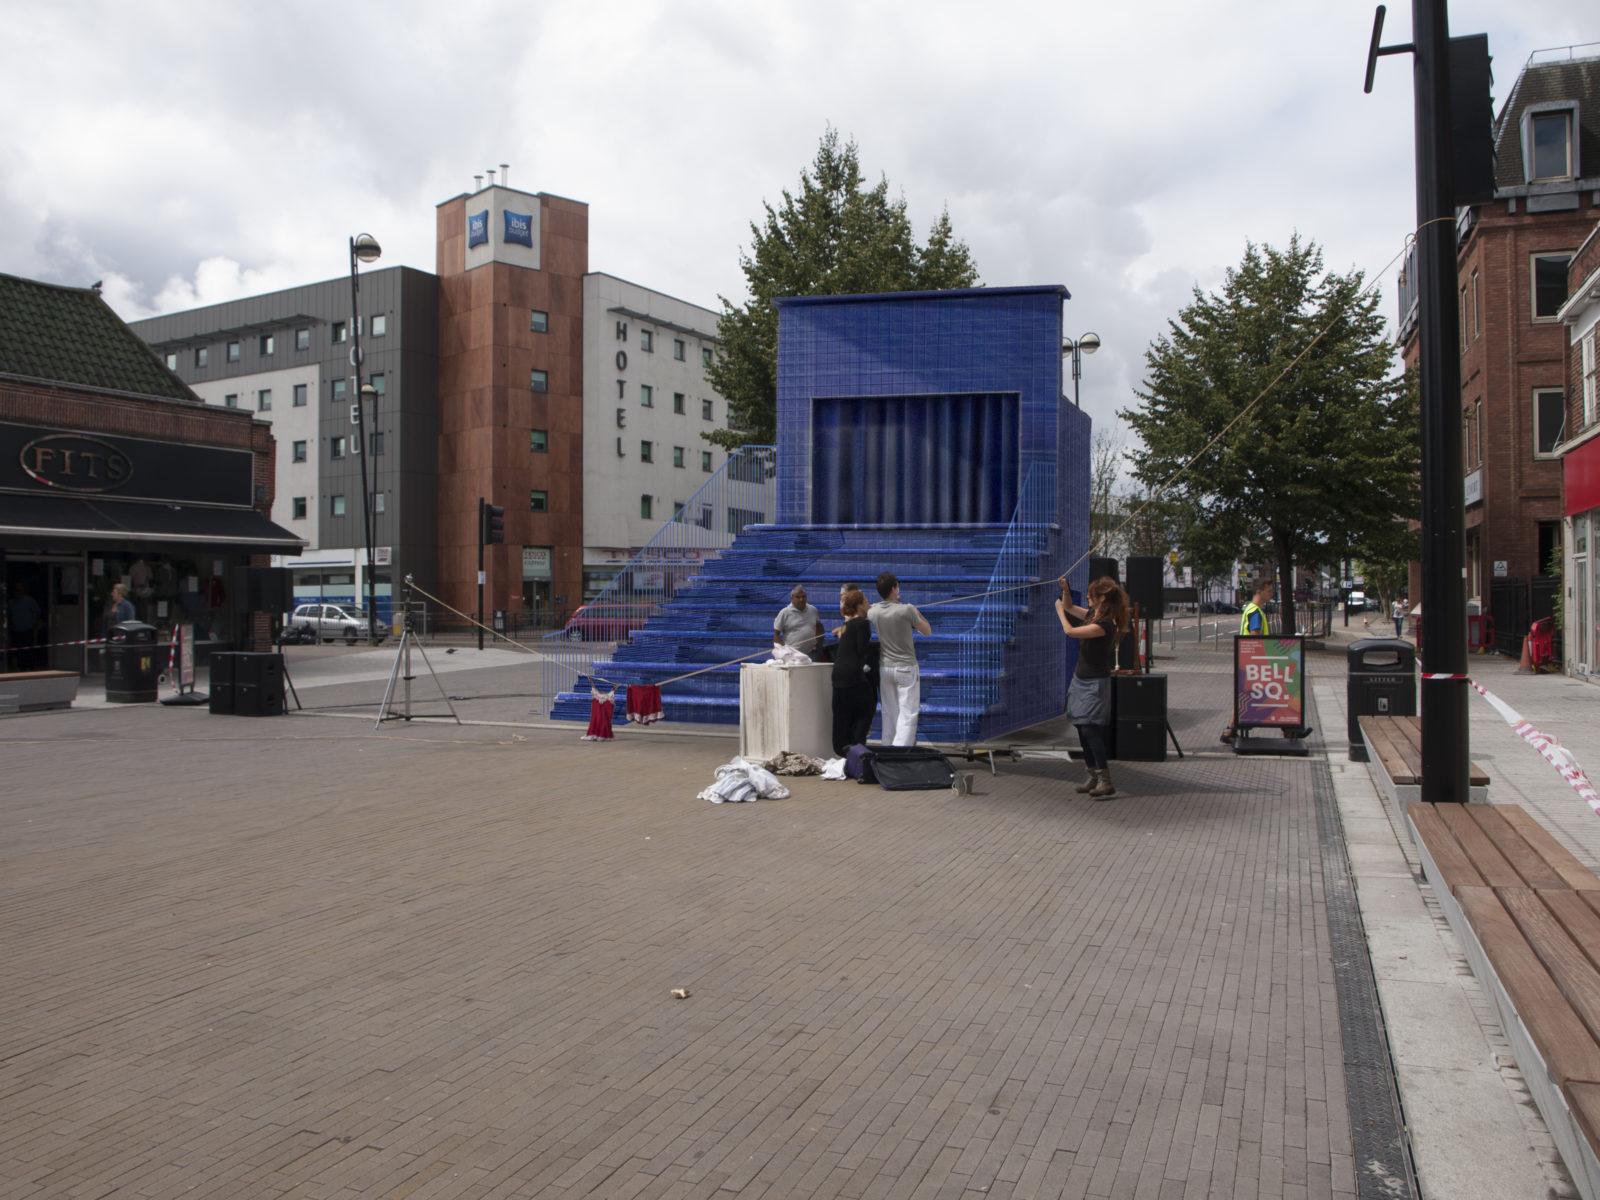 Bell Square Pavillion